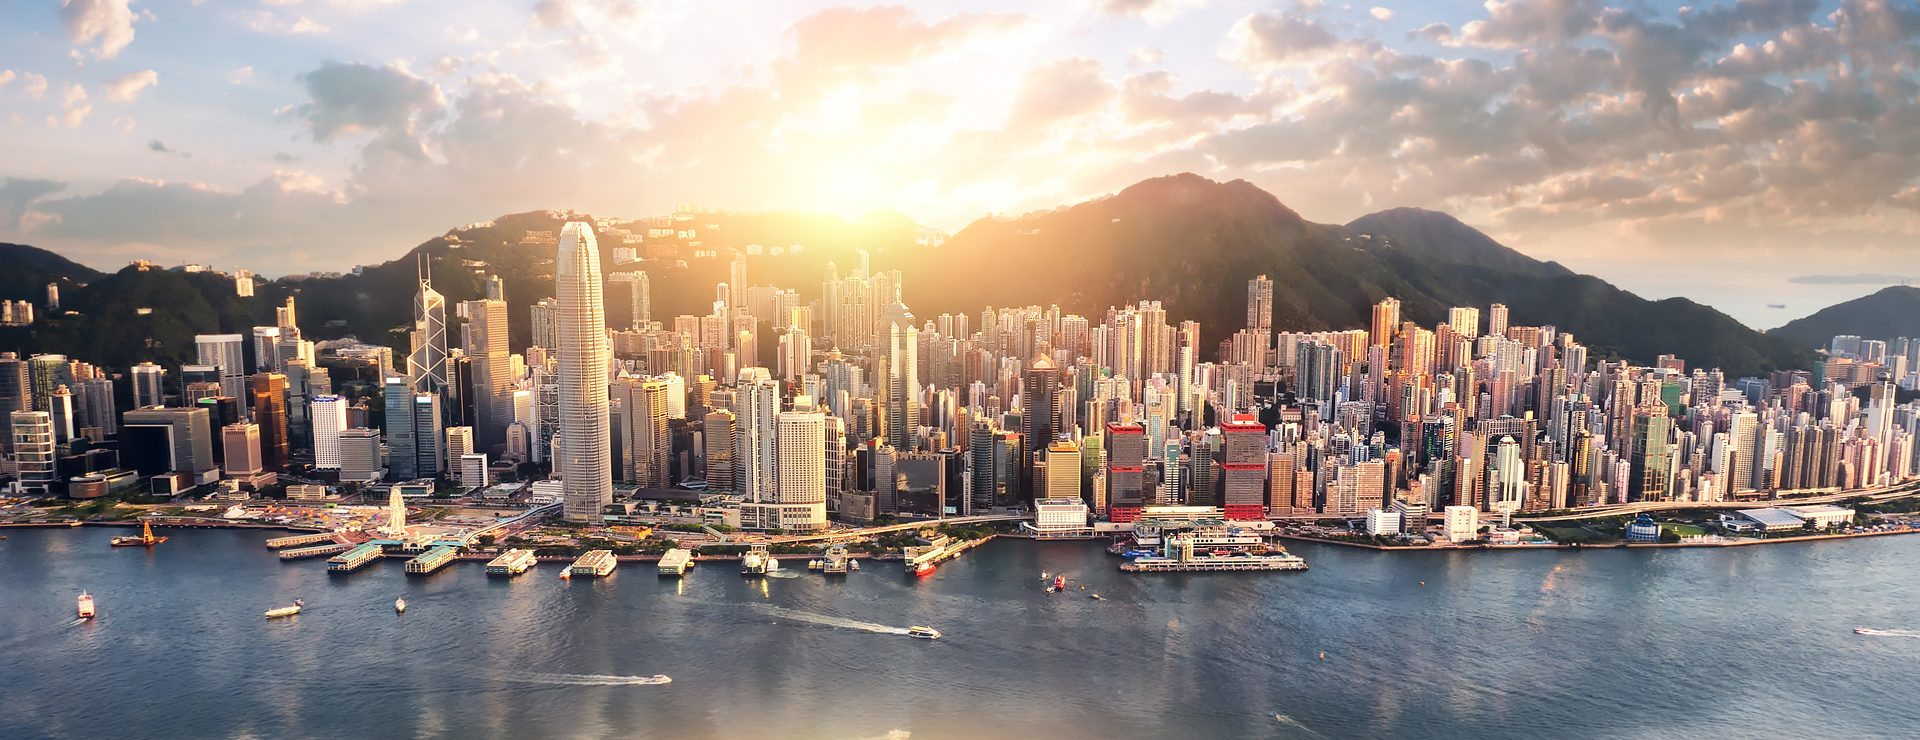 Hongkong & Macau